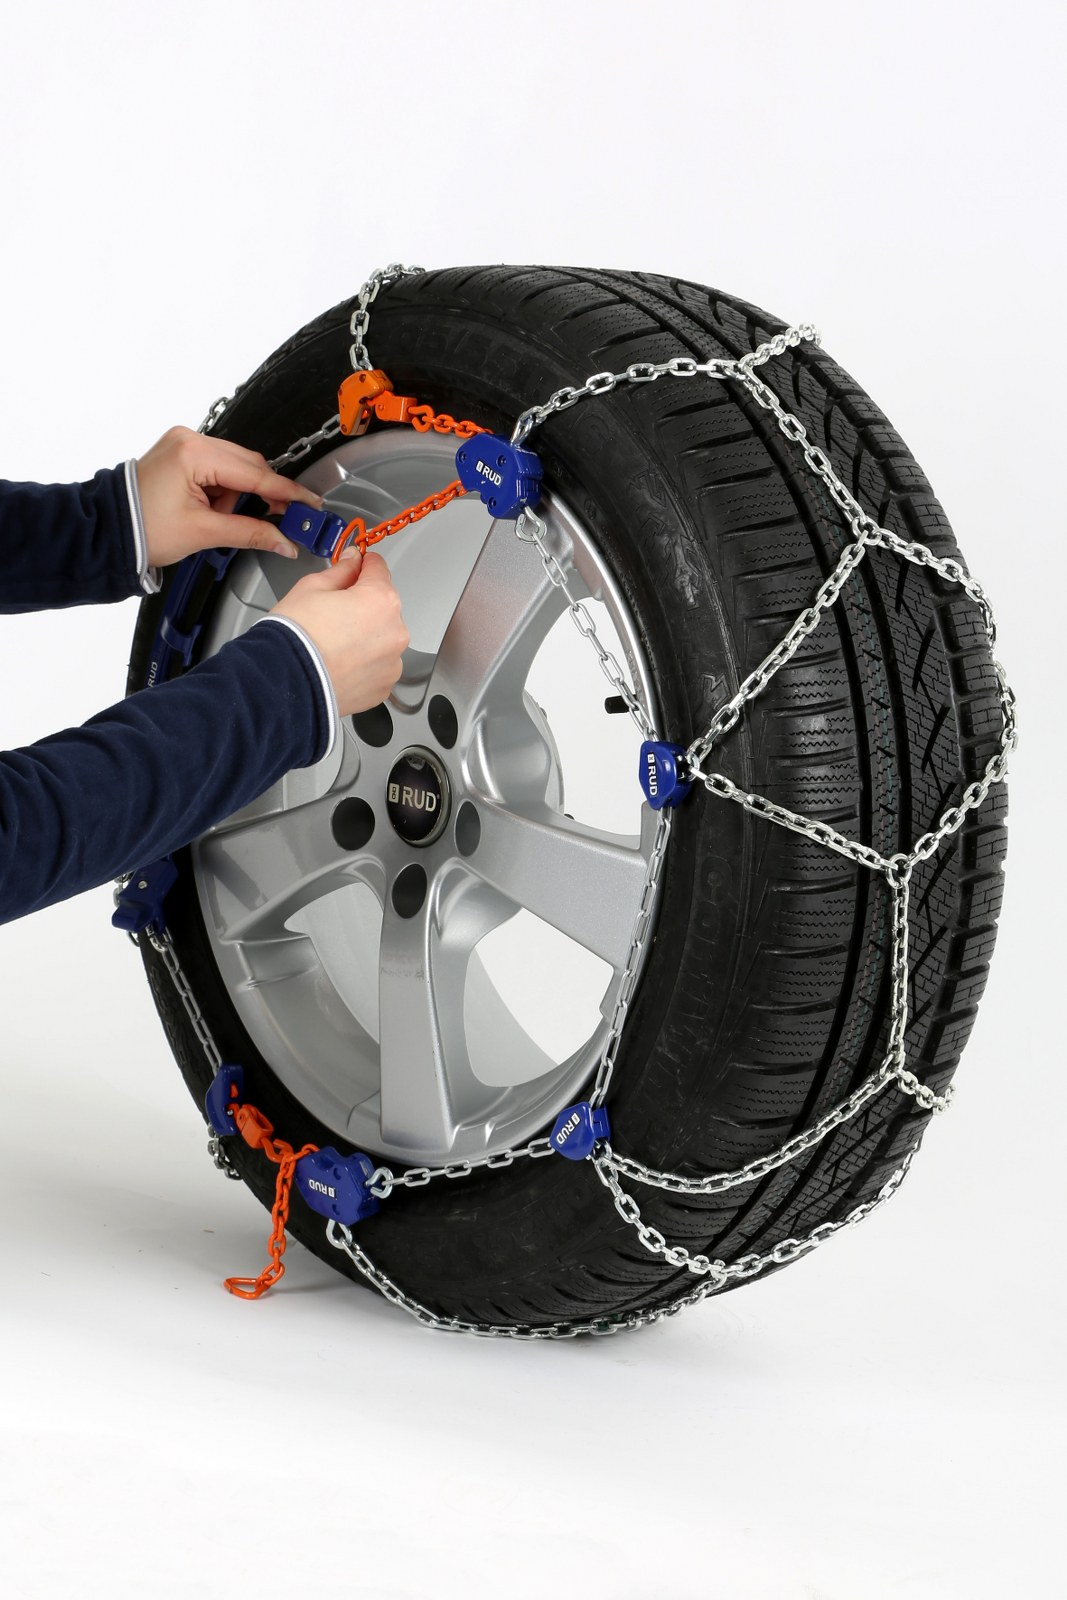 Lanturi auto Rud Compact Easy2go